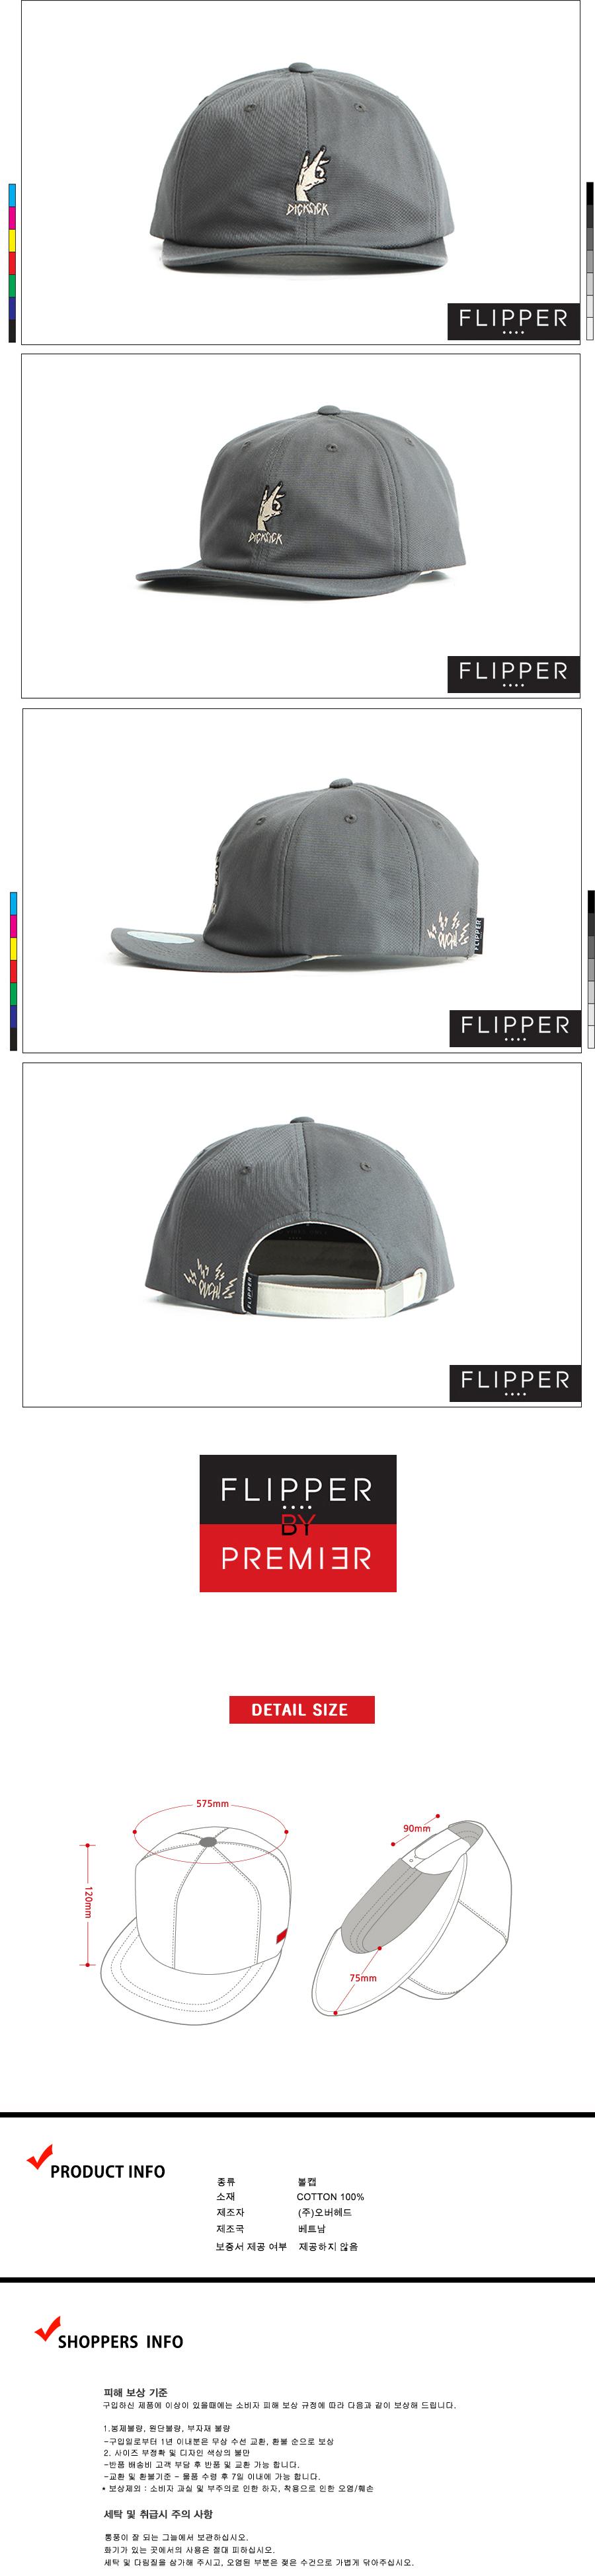 [ PREMIER ] [Premier] Flipper Ball Cap DICKSICK Charcoal (FL061)